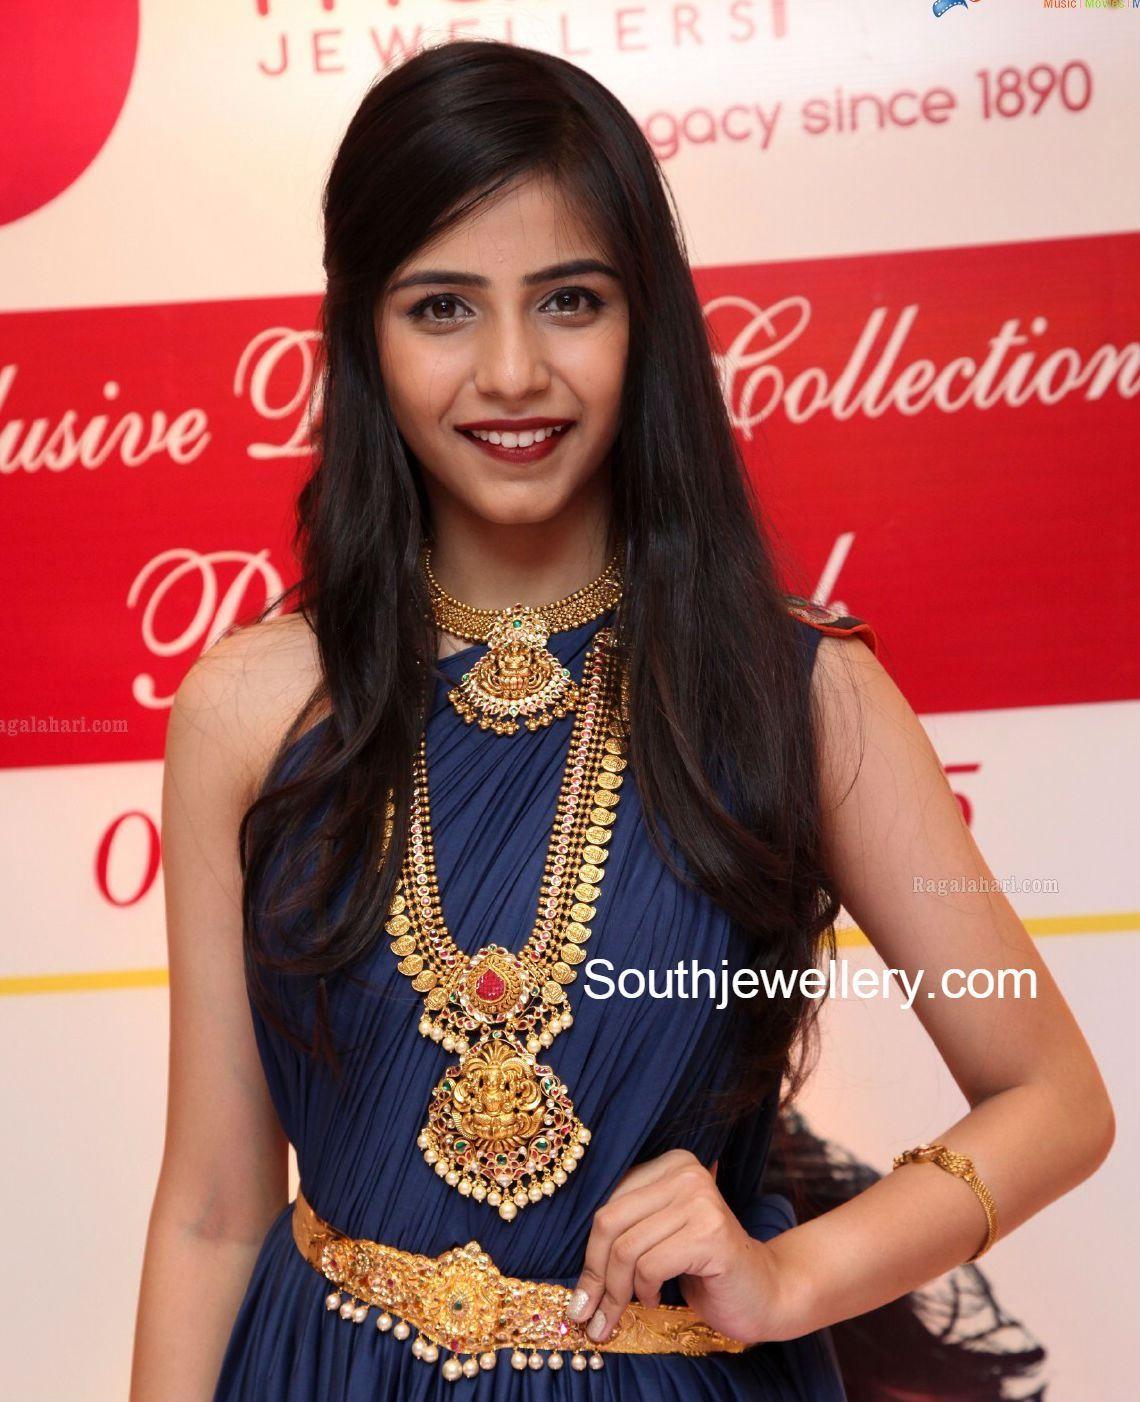 Suhasini in gundla haram jewellery designs - Gold Jewellery Jewellery Designs Jewelery